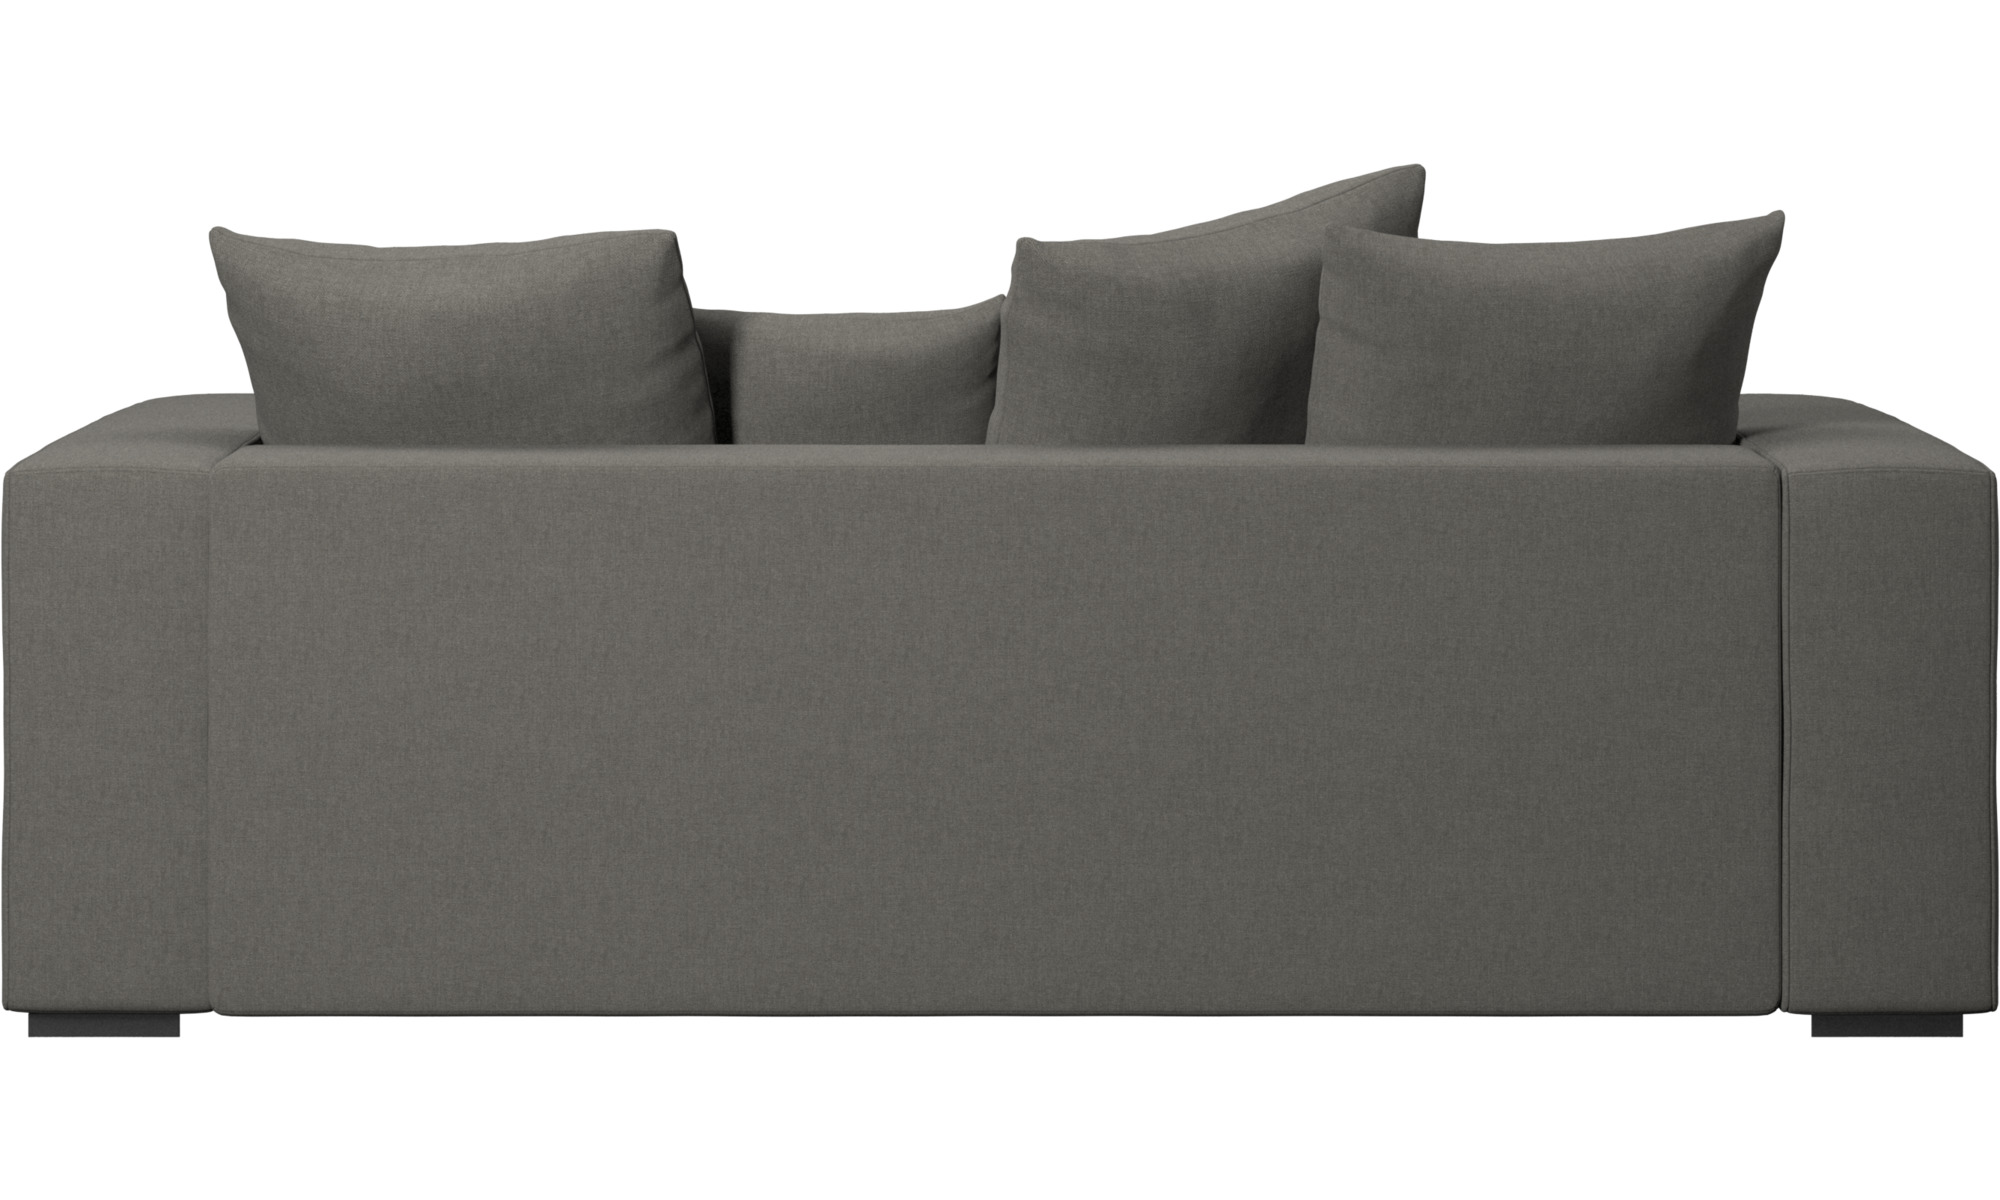 2 5 Seater Sofas Cenova Divano